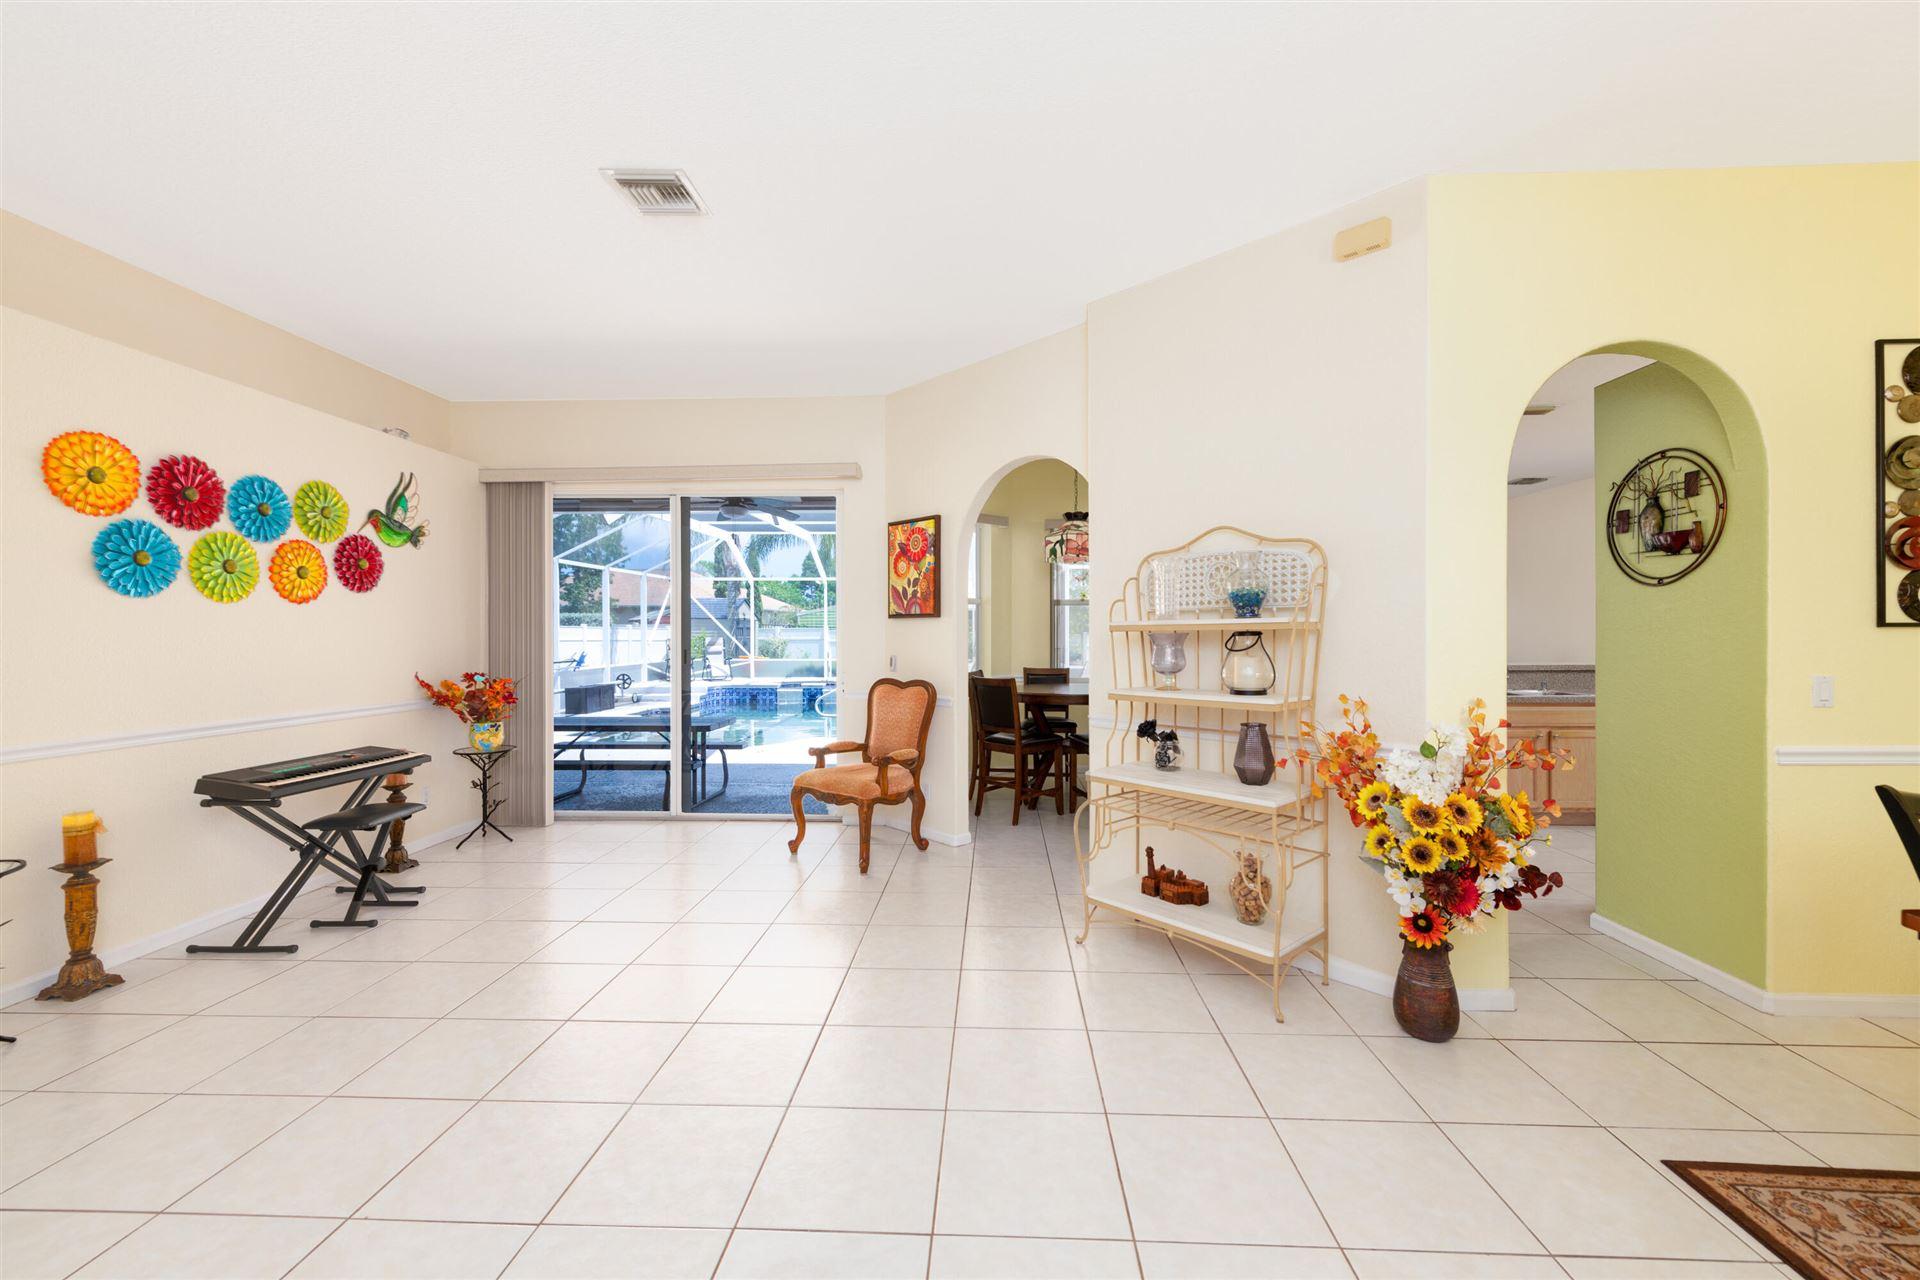 5879 NW Cincy Court, Port Saint Lucie, FL 34986 - MLS#: RX-10742710